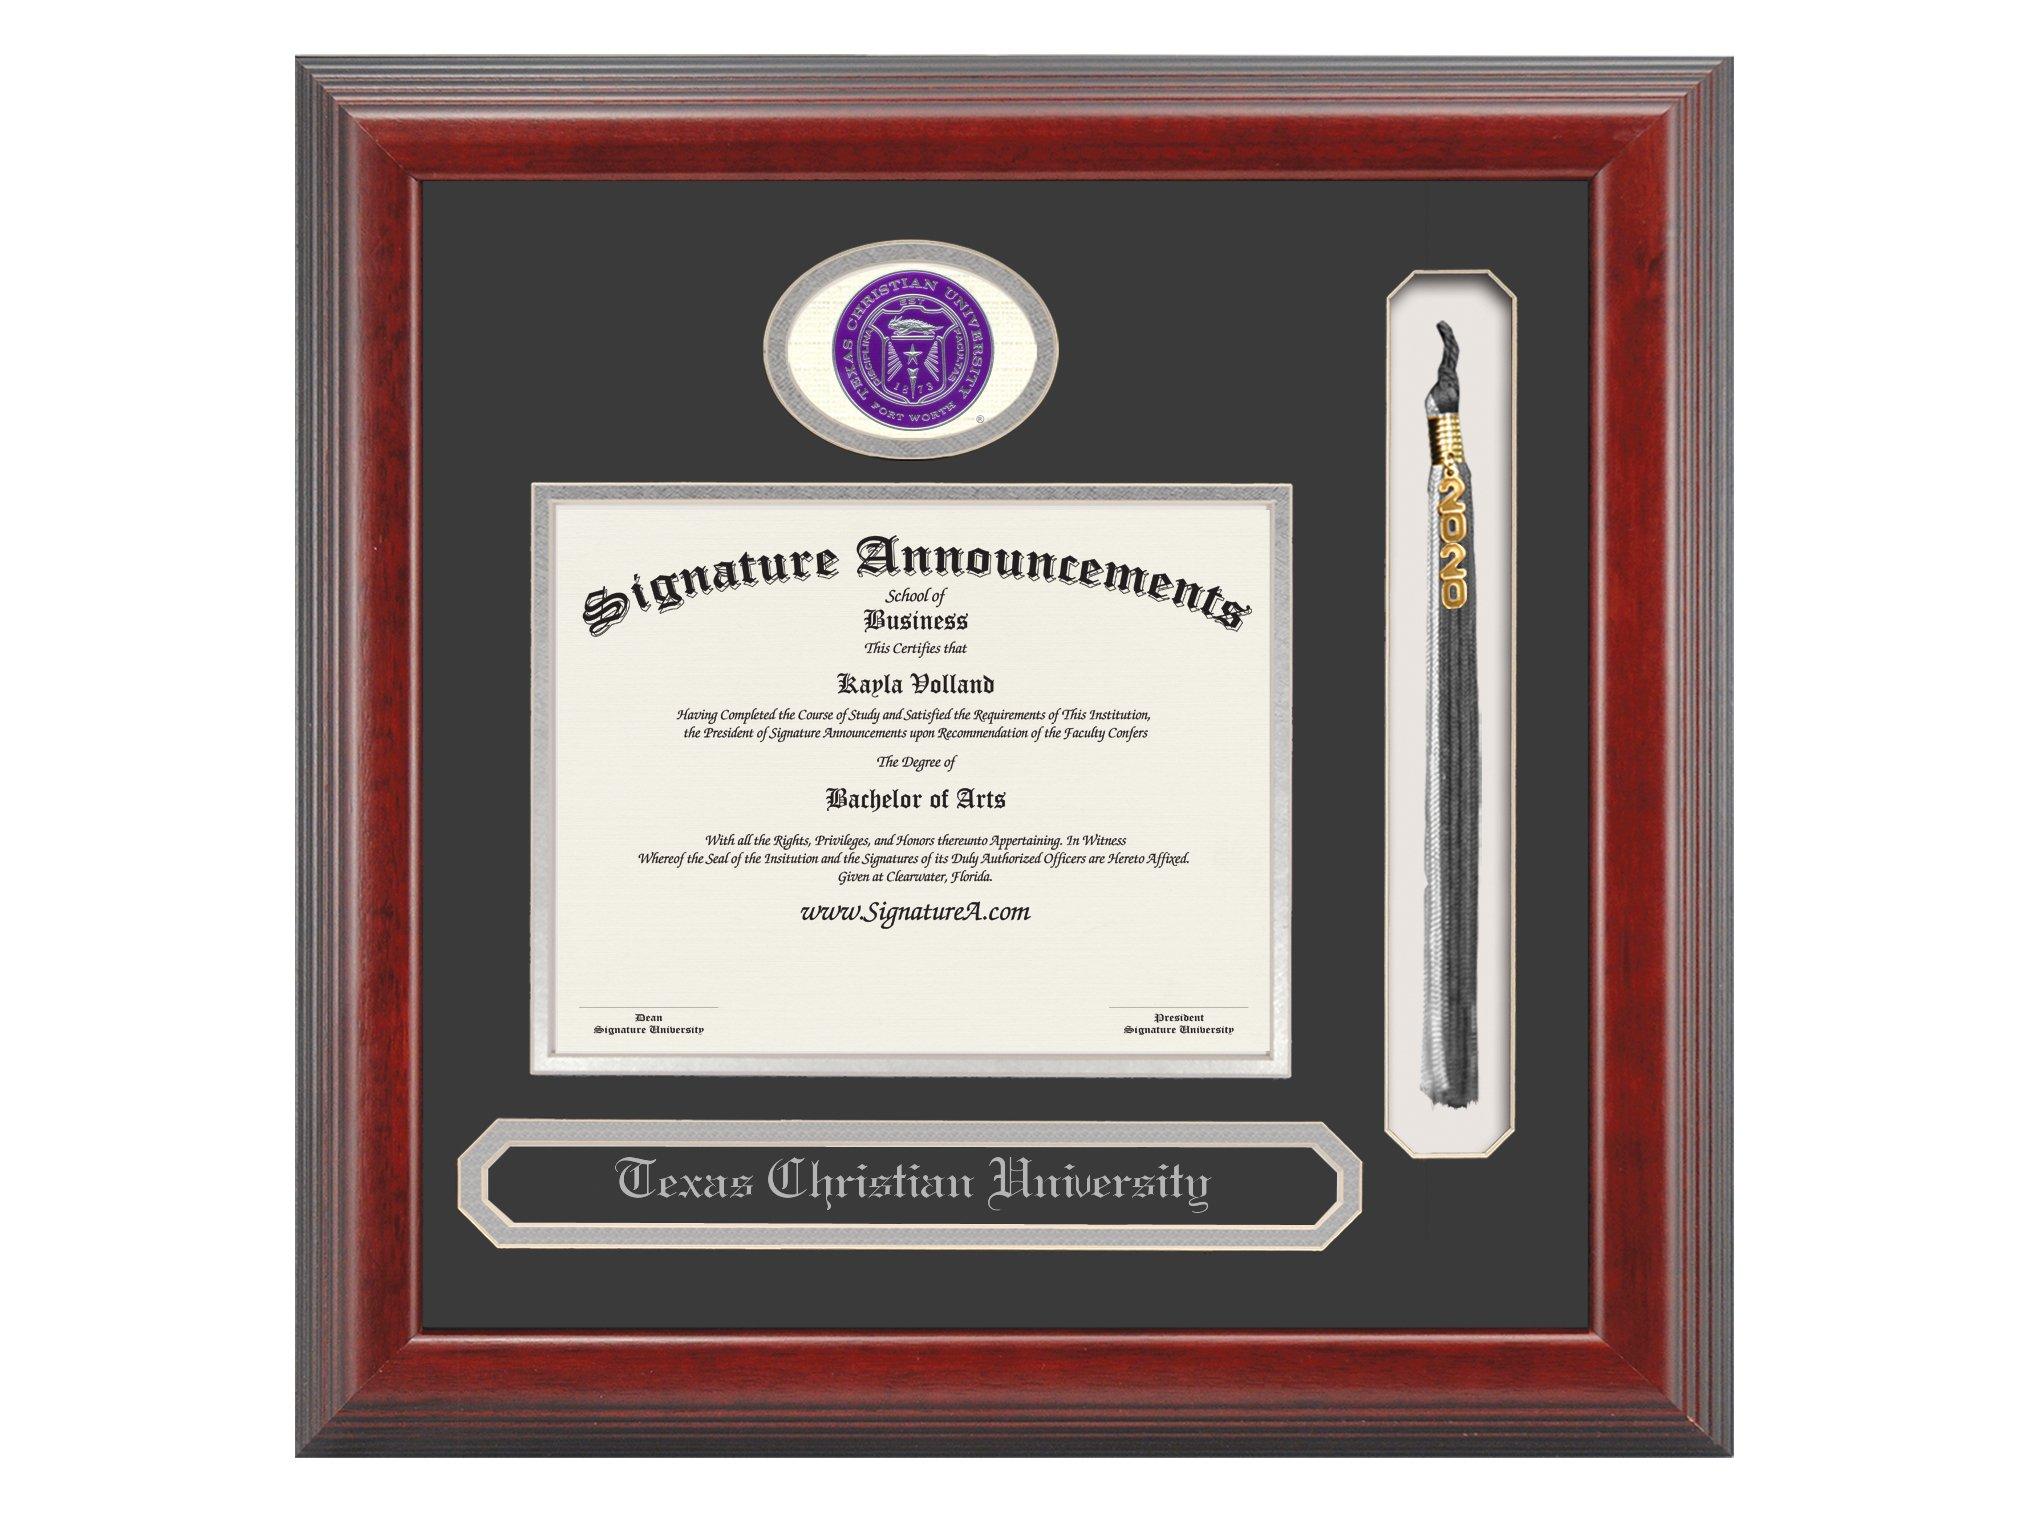 Signature Announcements Texas Christian University (TCU) Undergraduate and Graduate/Professional/Doctor Graduation Diploma Frame with Sculpted Foil Seal, Name & Tassel (Cherry, 16 x 16)